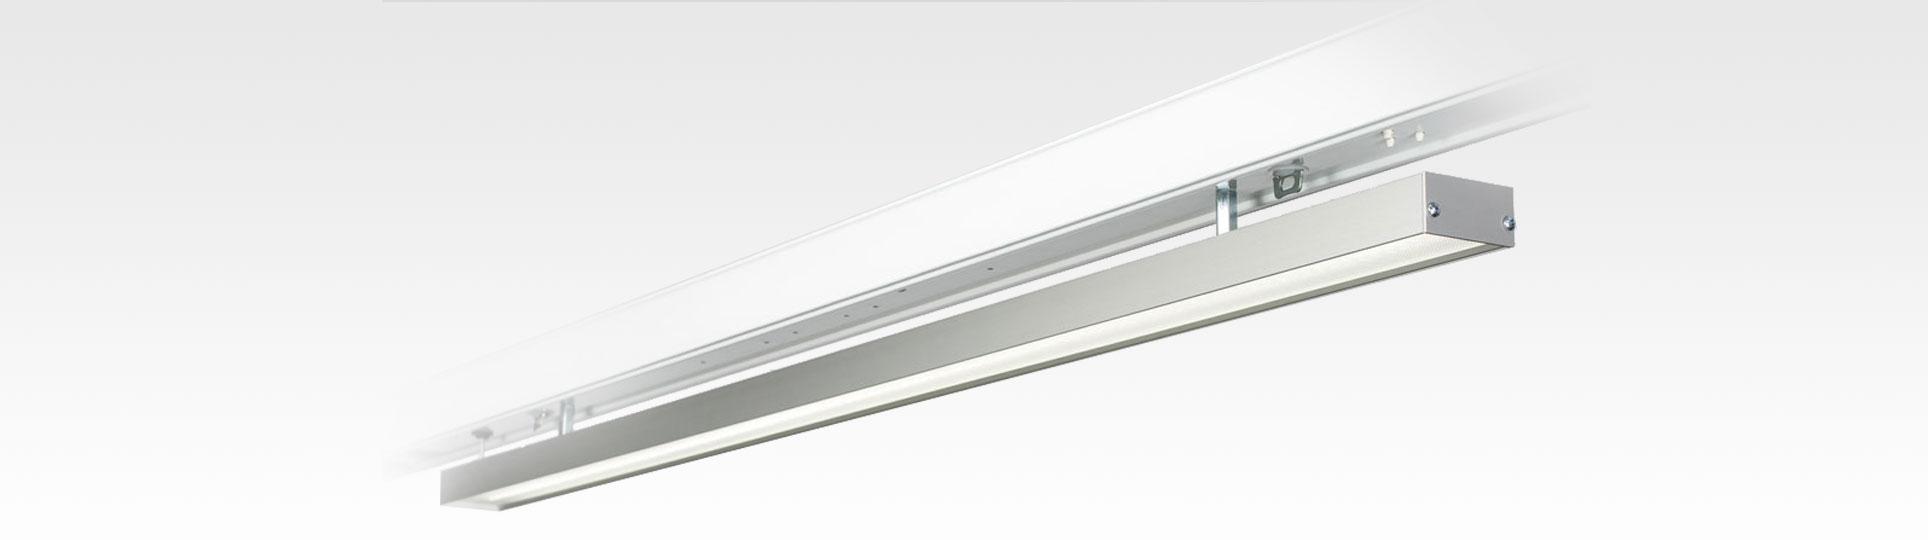 LED Linienleuchte LOGIC Glas Linelight